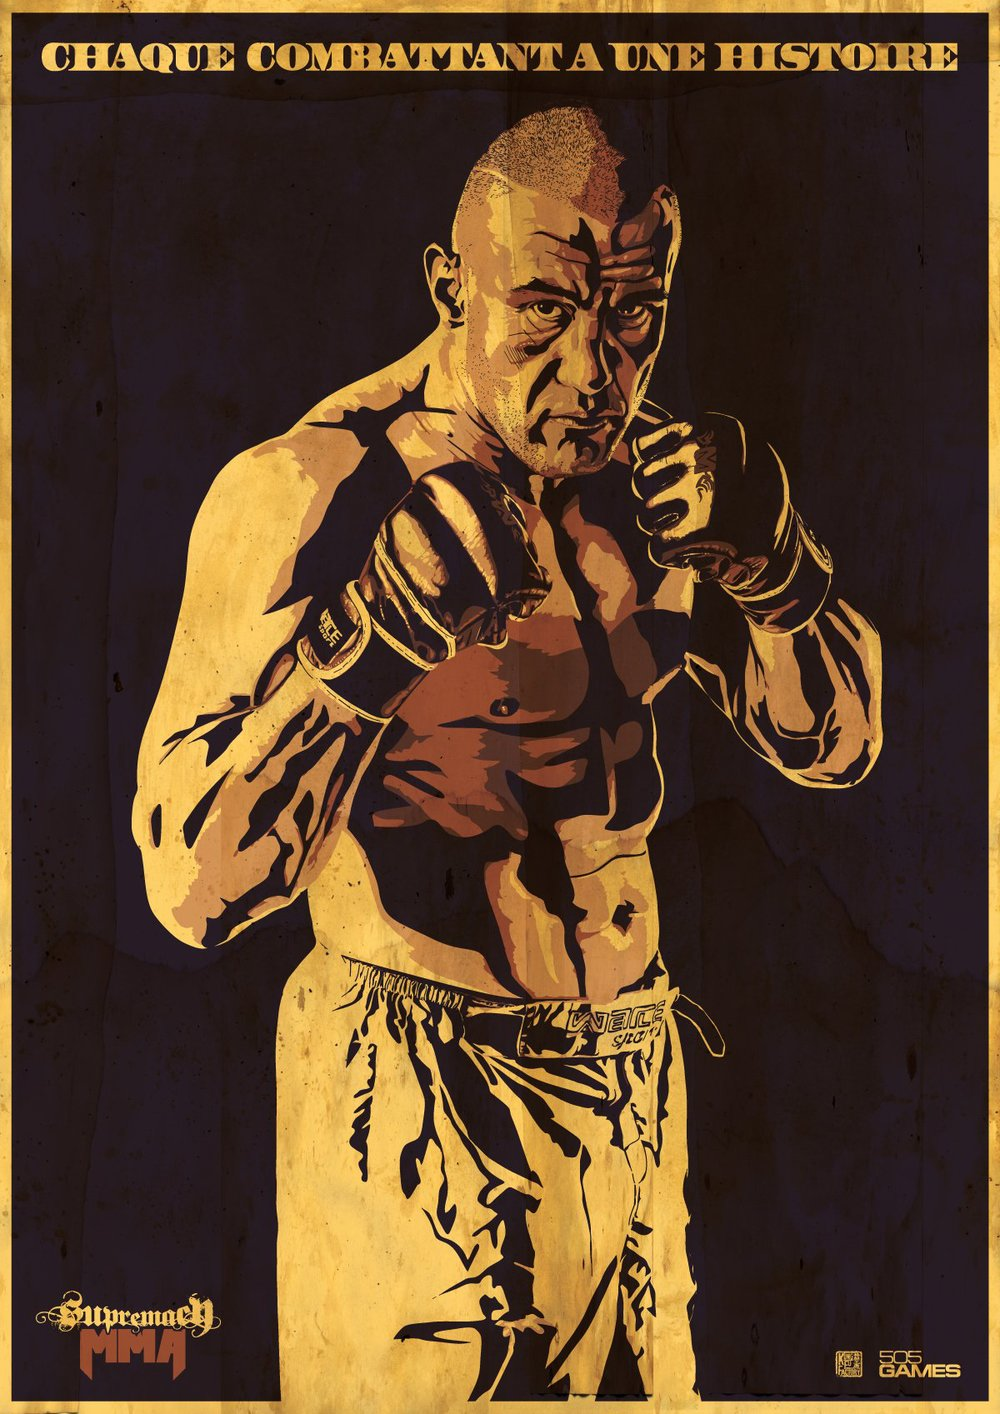 Supremacy MMA - Jerome Poster